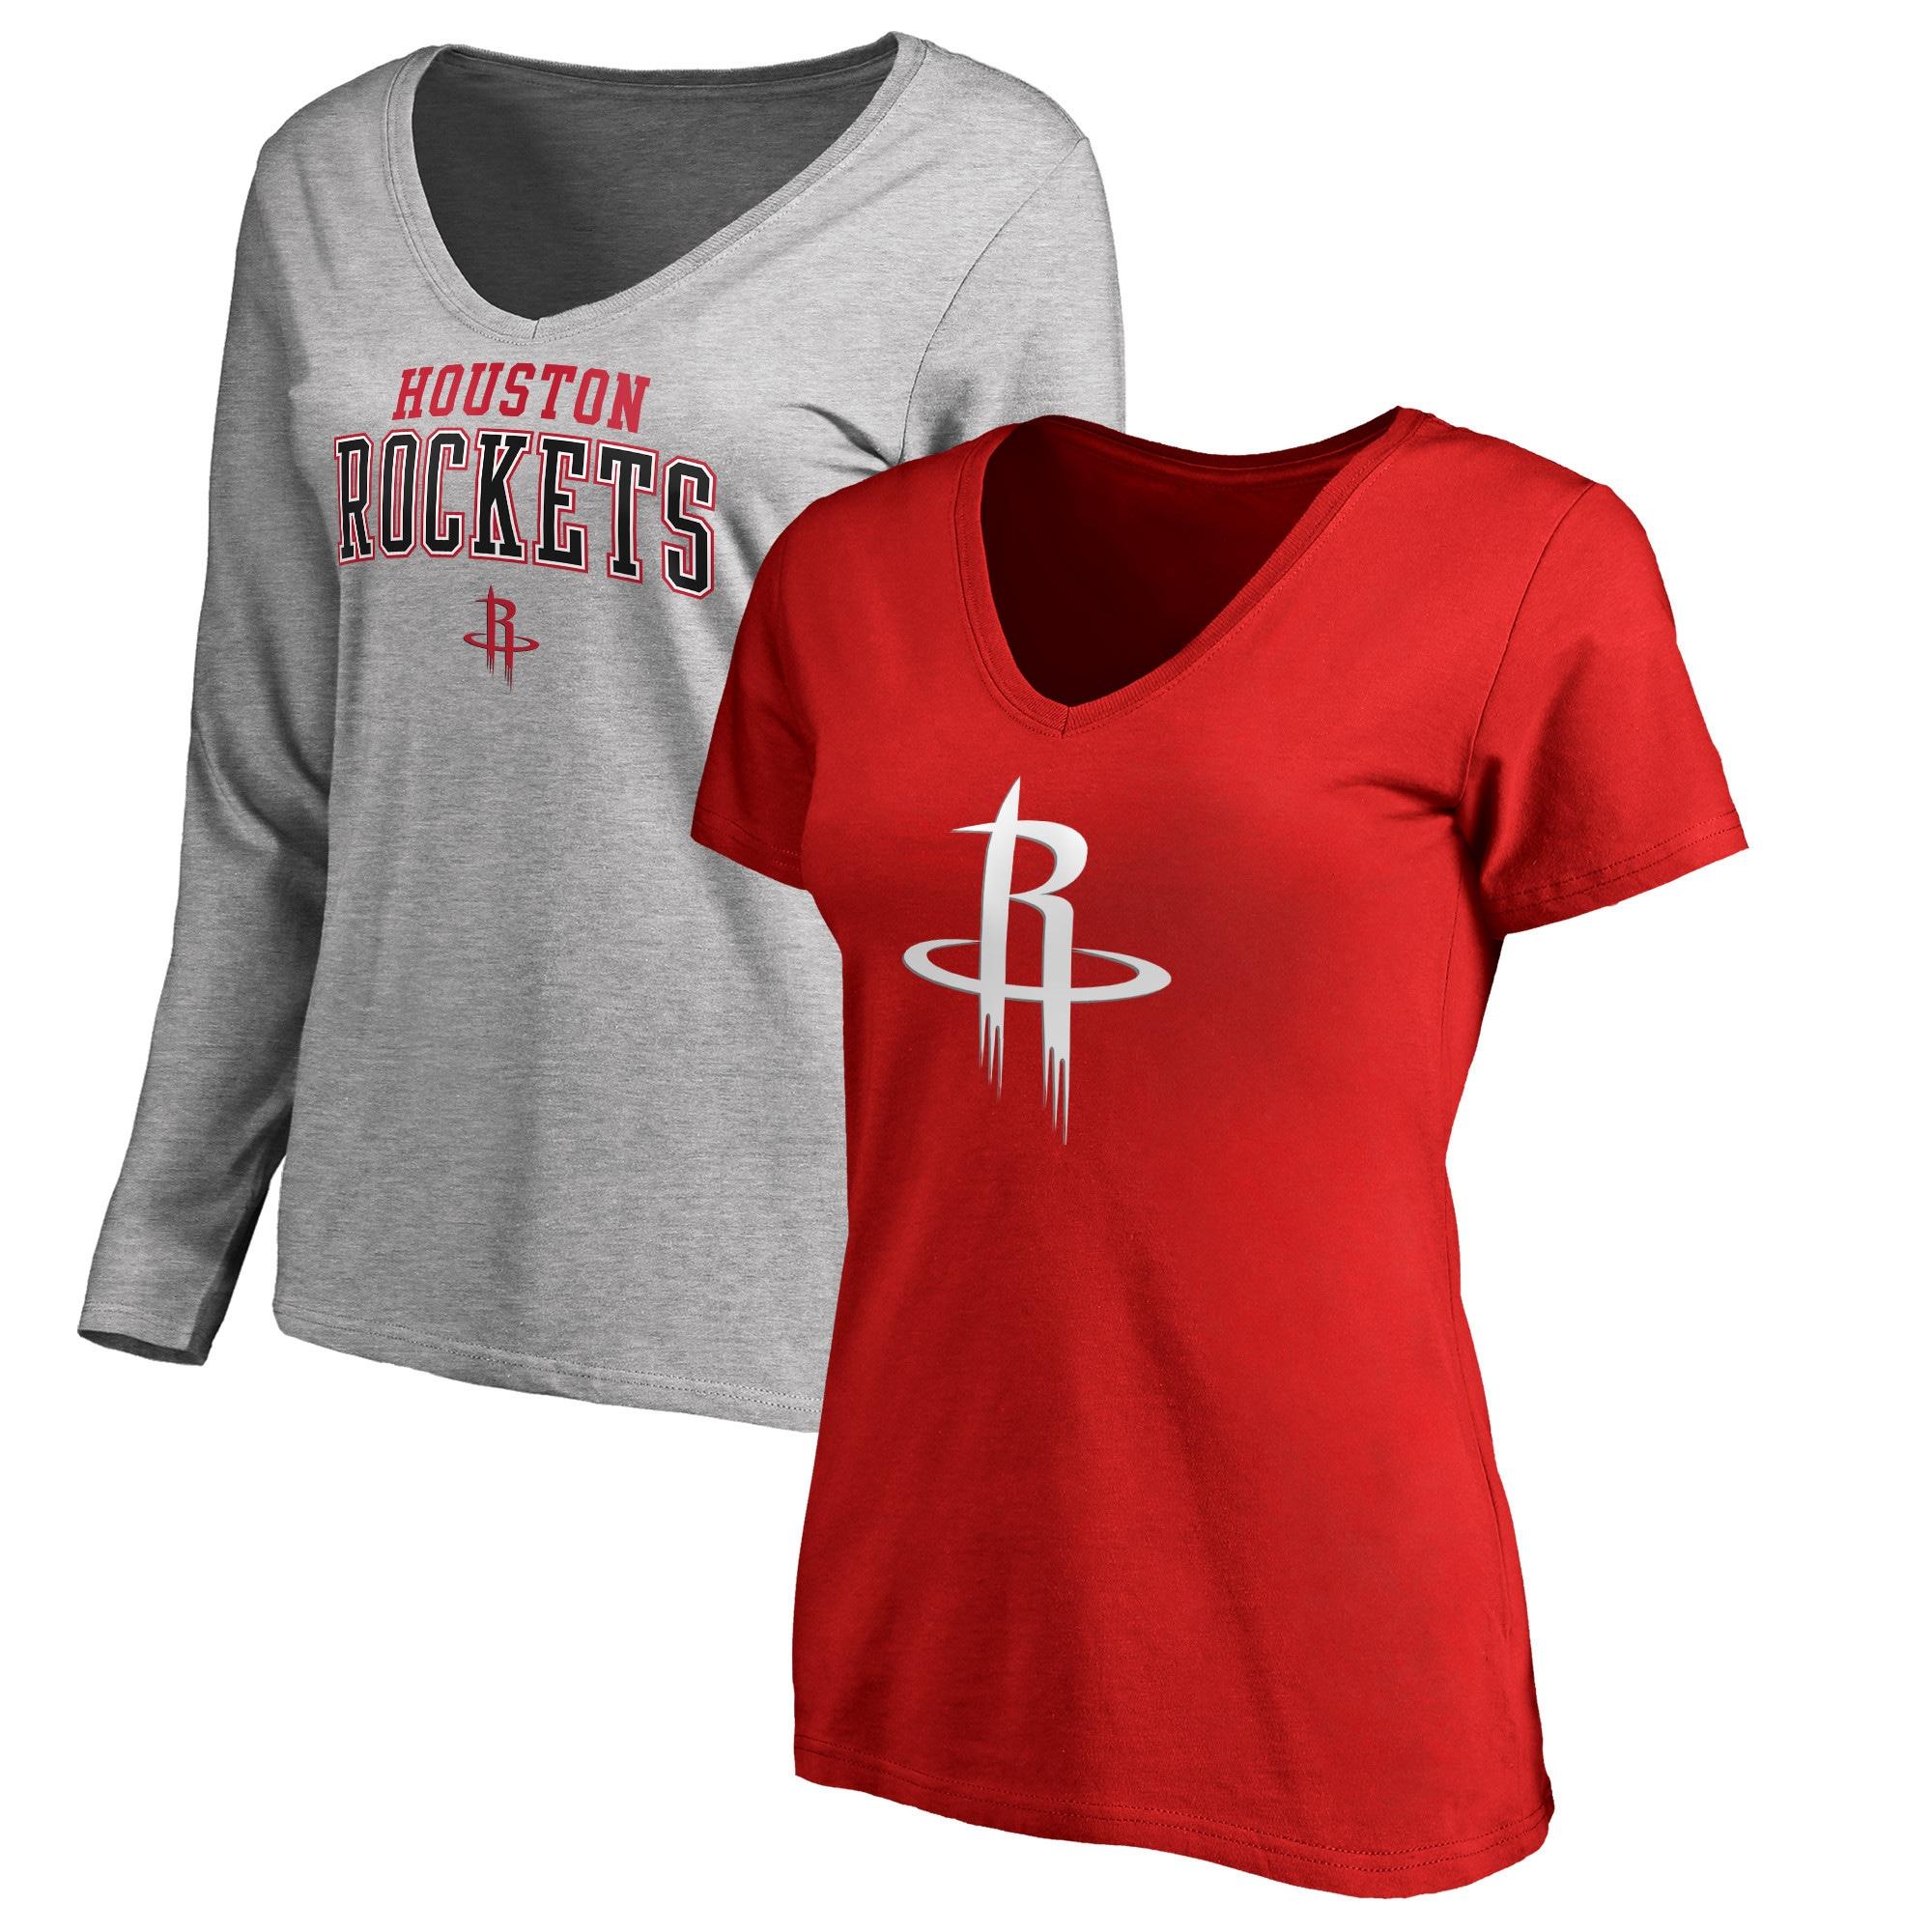 Houston Rockets Fanatics Branded Women's Square V-Neck T-Shirt Combo Set - Red/Gray